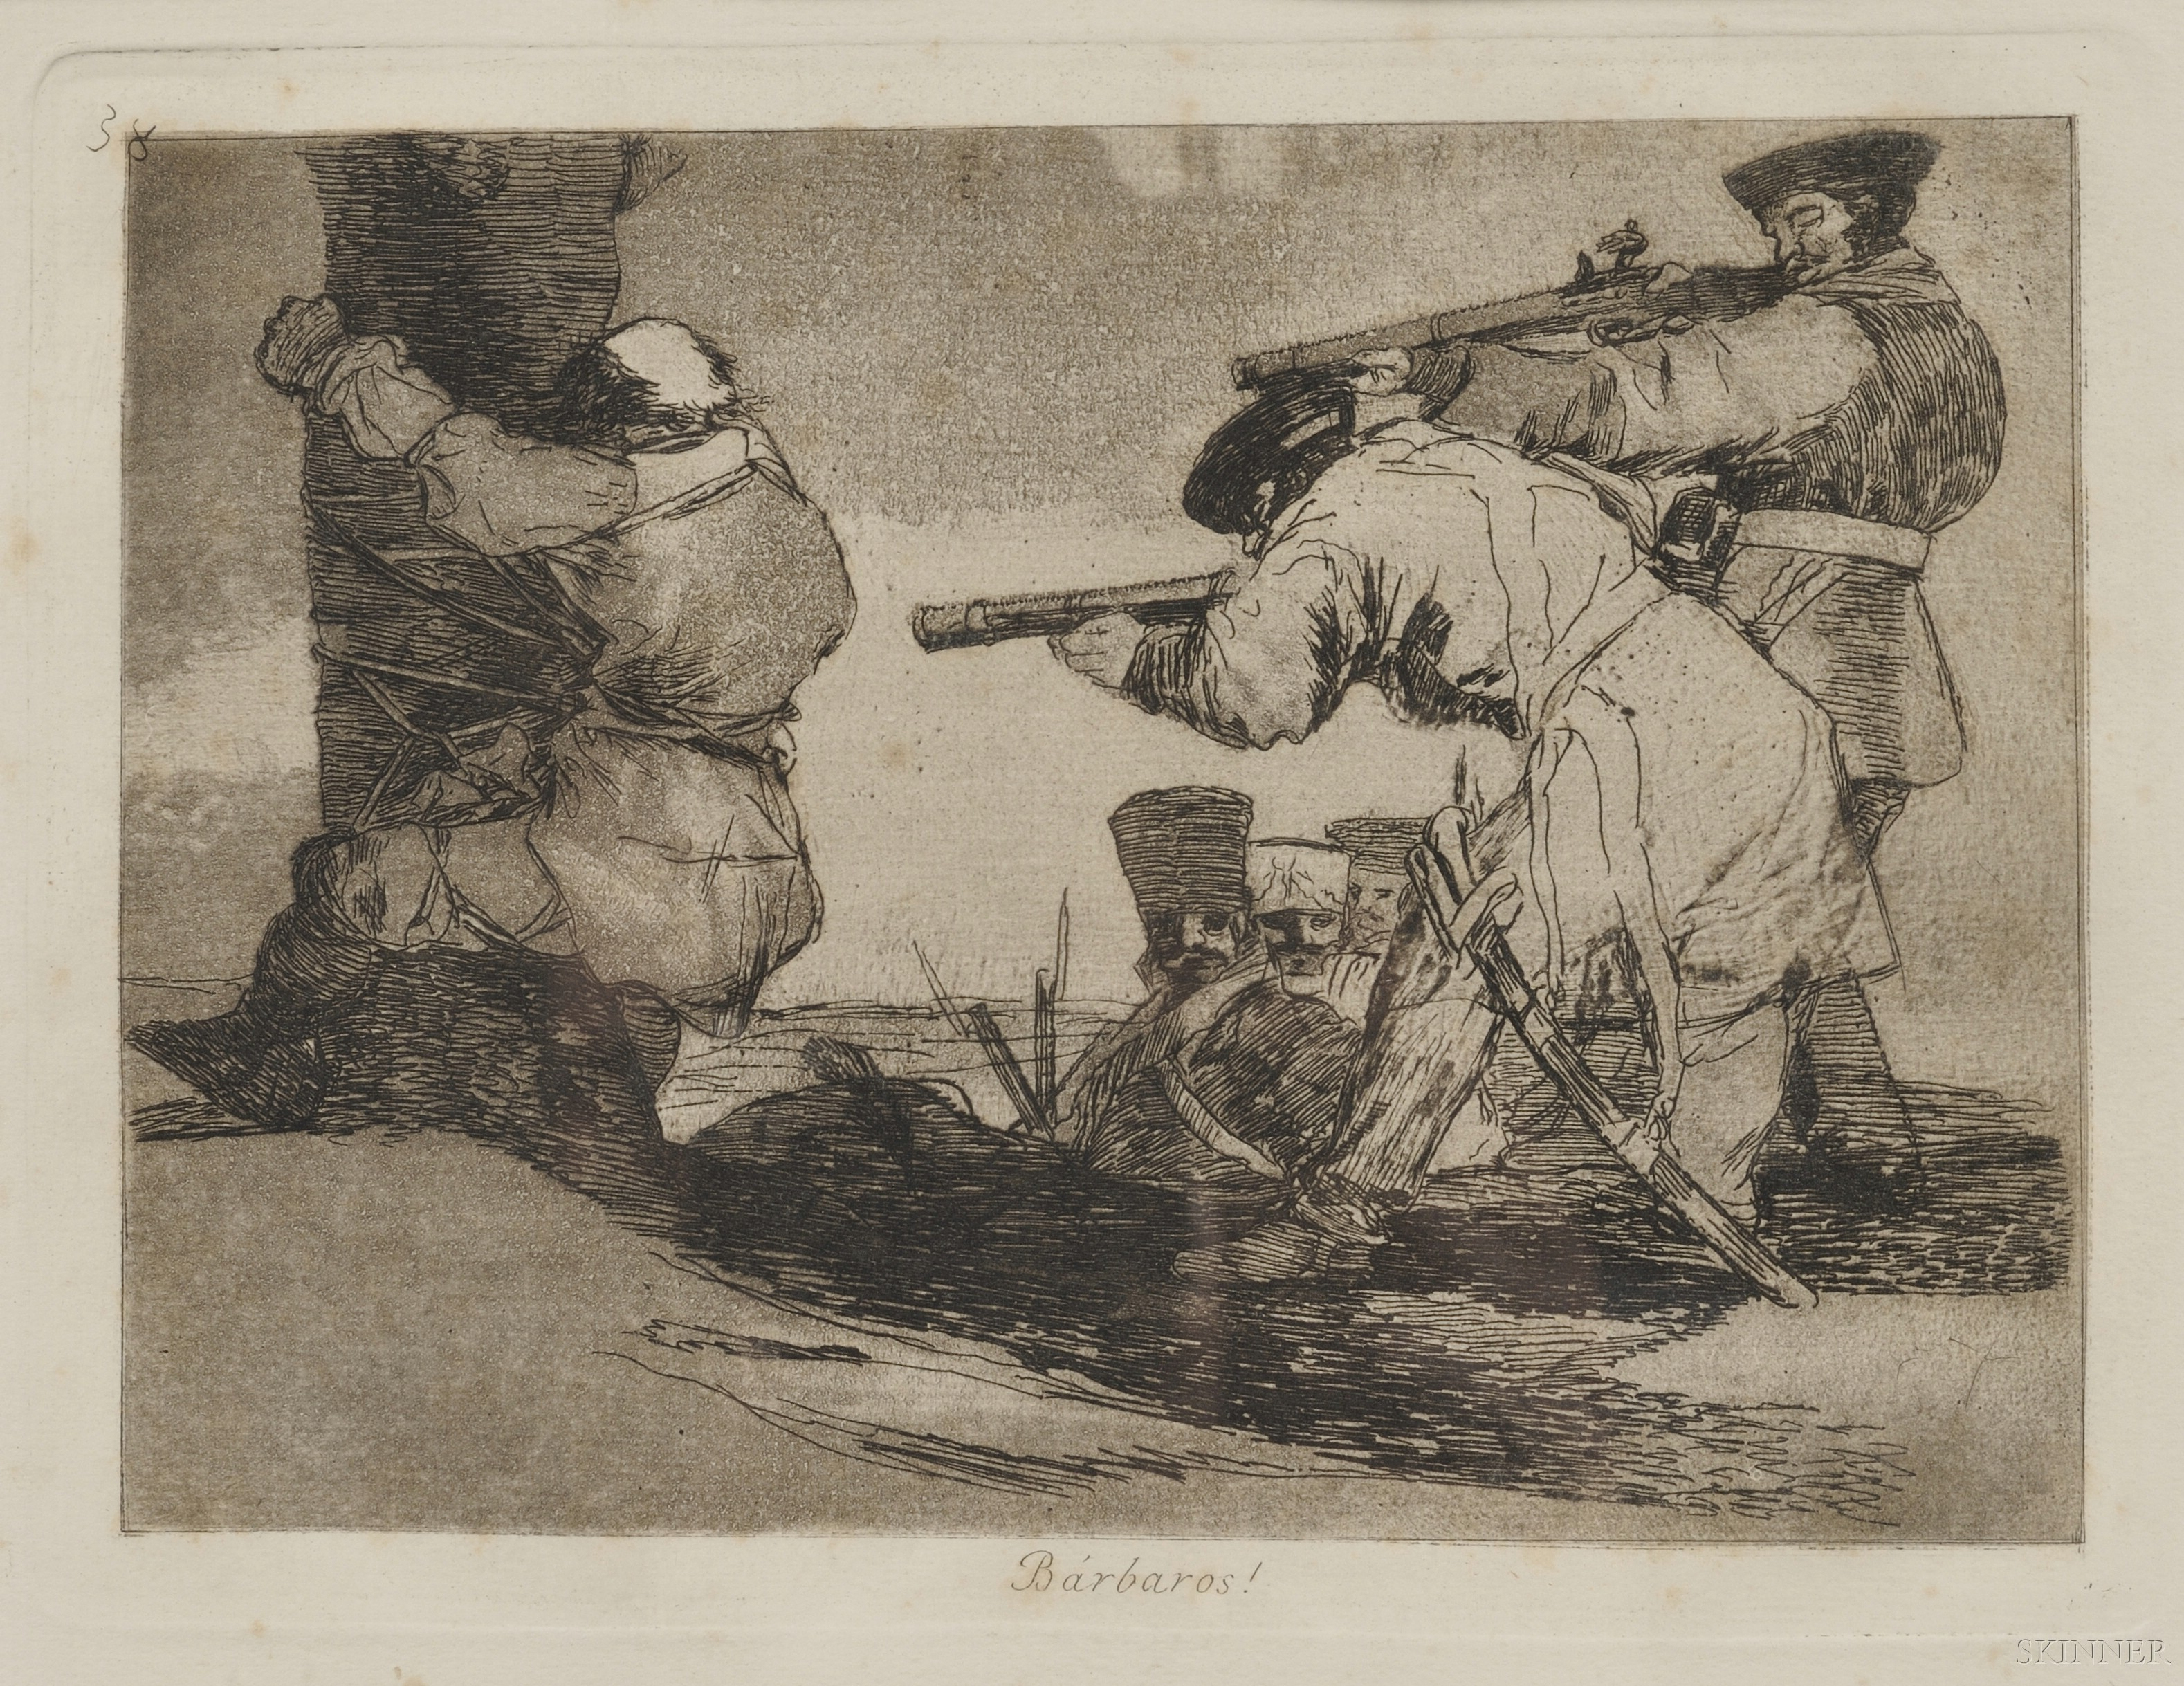 Francisco de Goya (Spanish, 1746-1828)      Bárbaros!